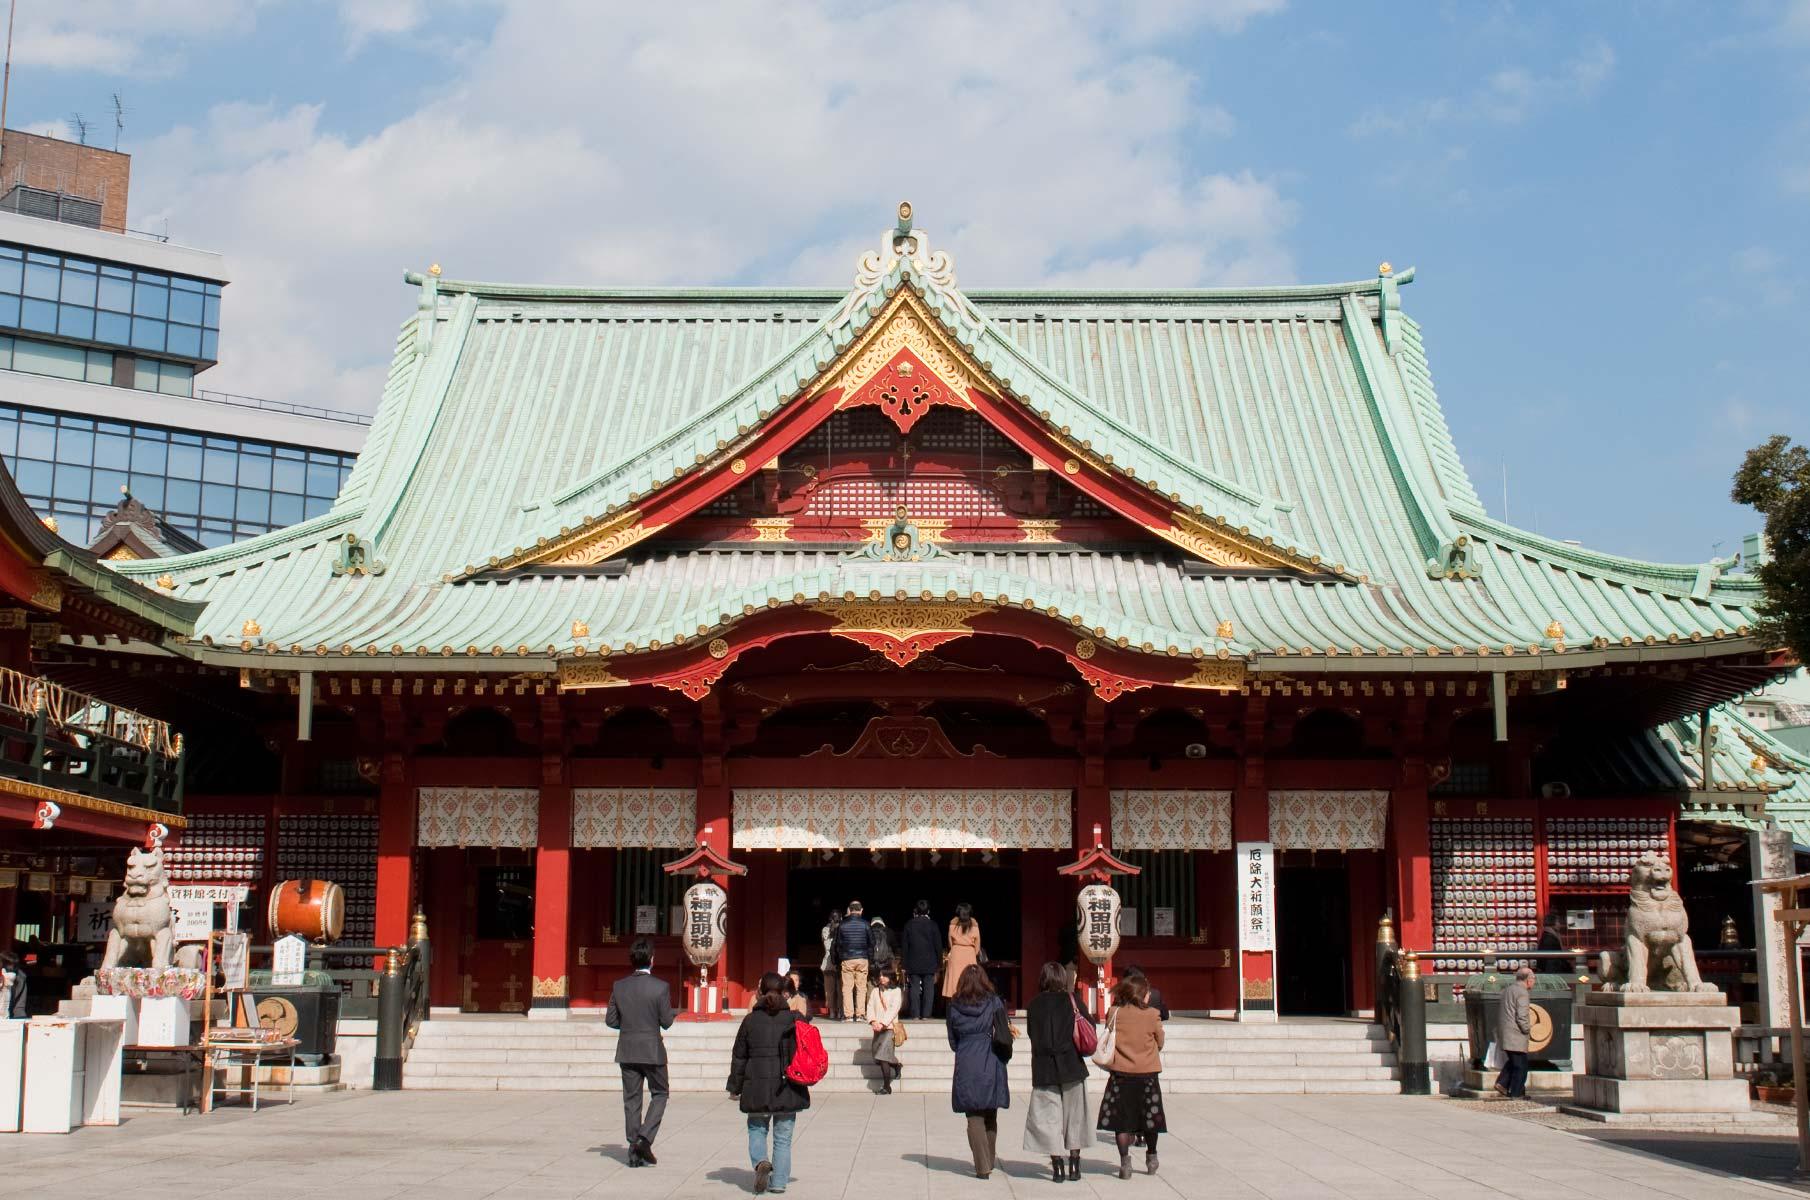 Kanda Myojin Tempel in Akihabara Tokyo, Japan